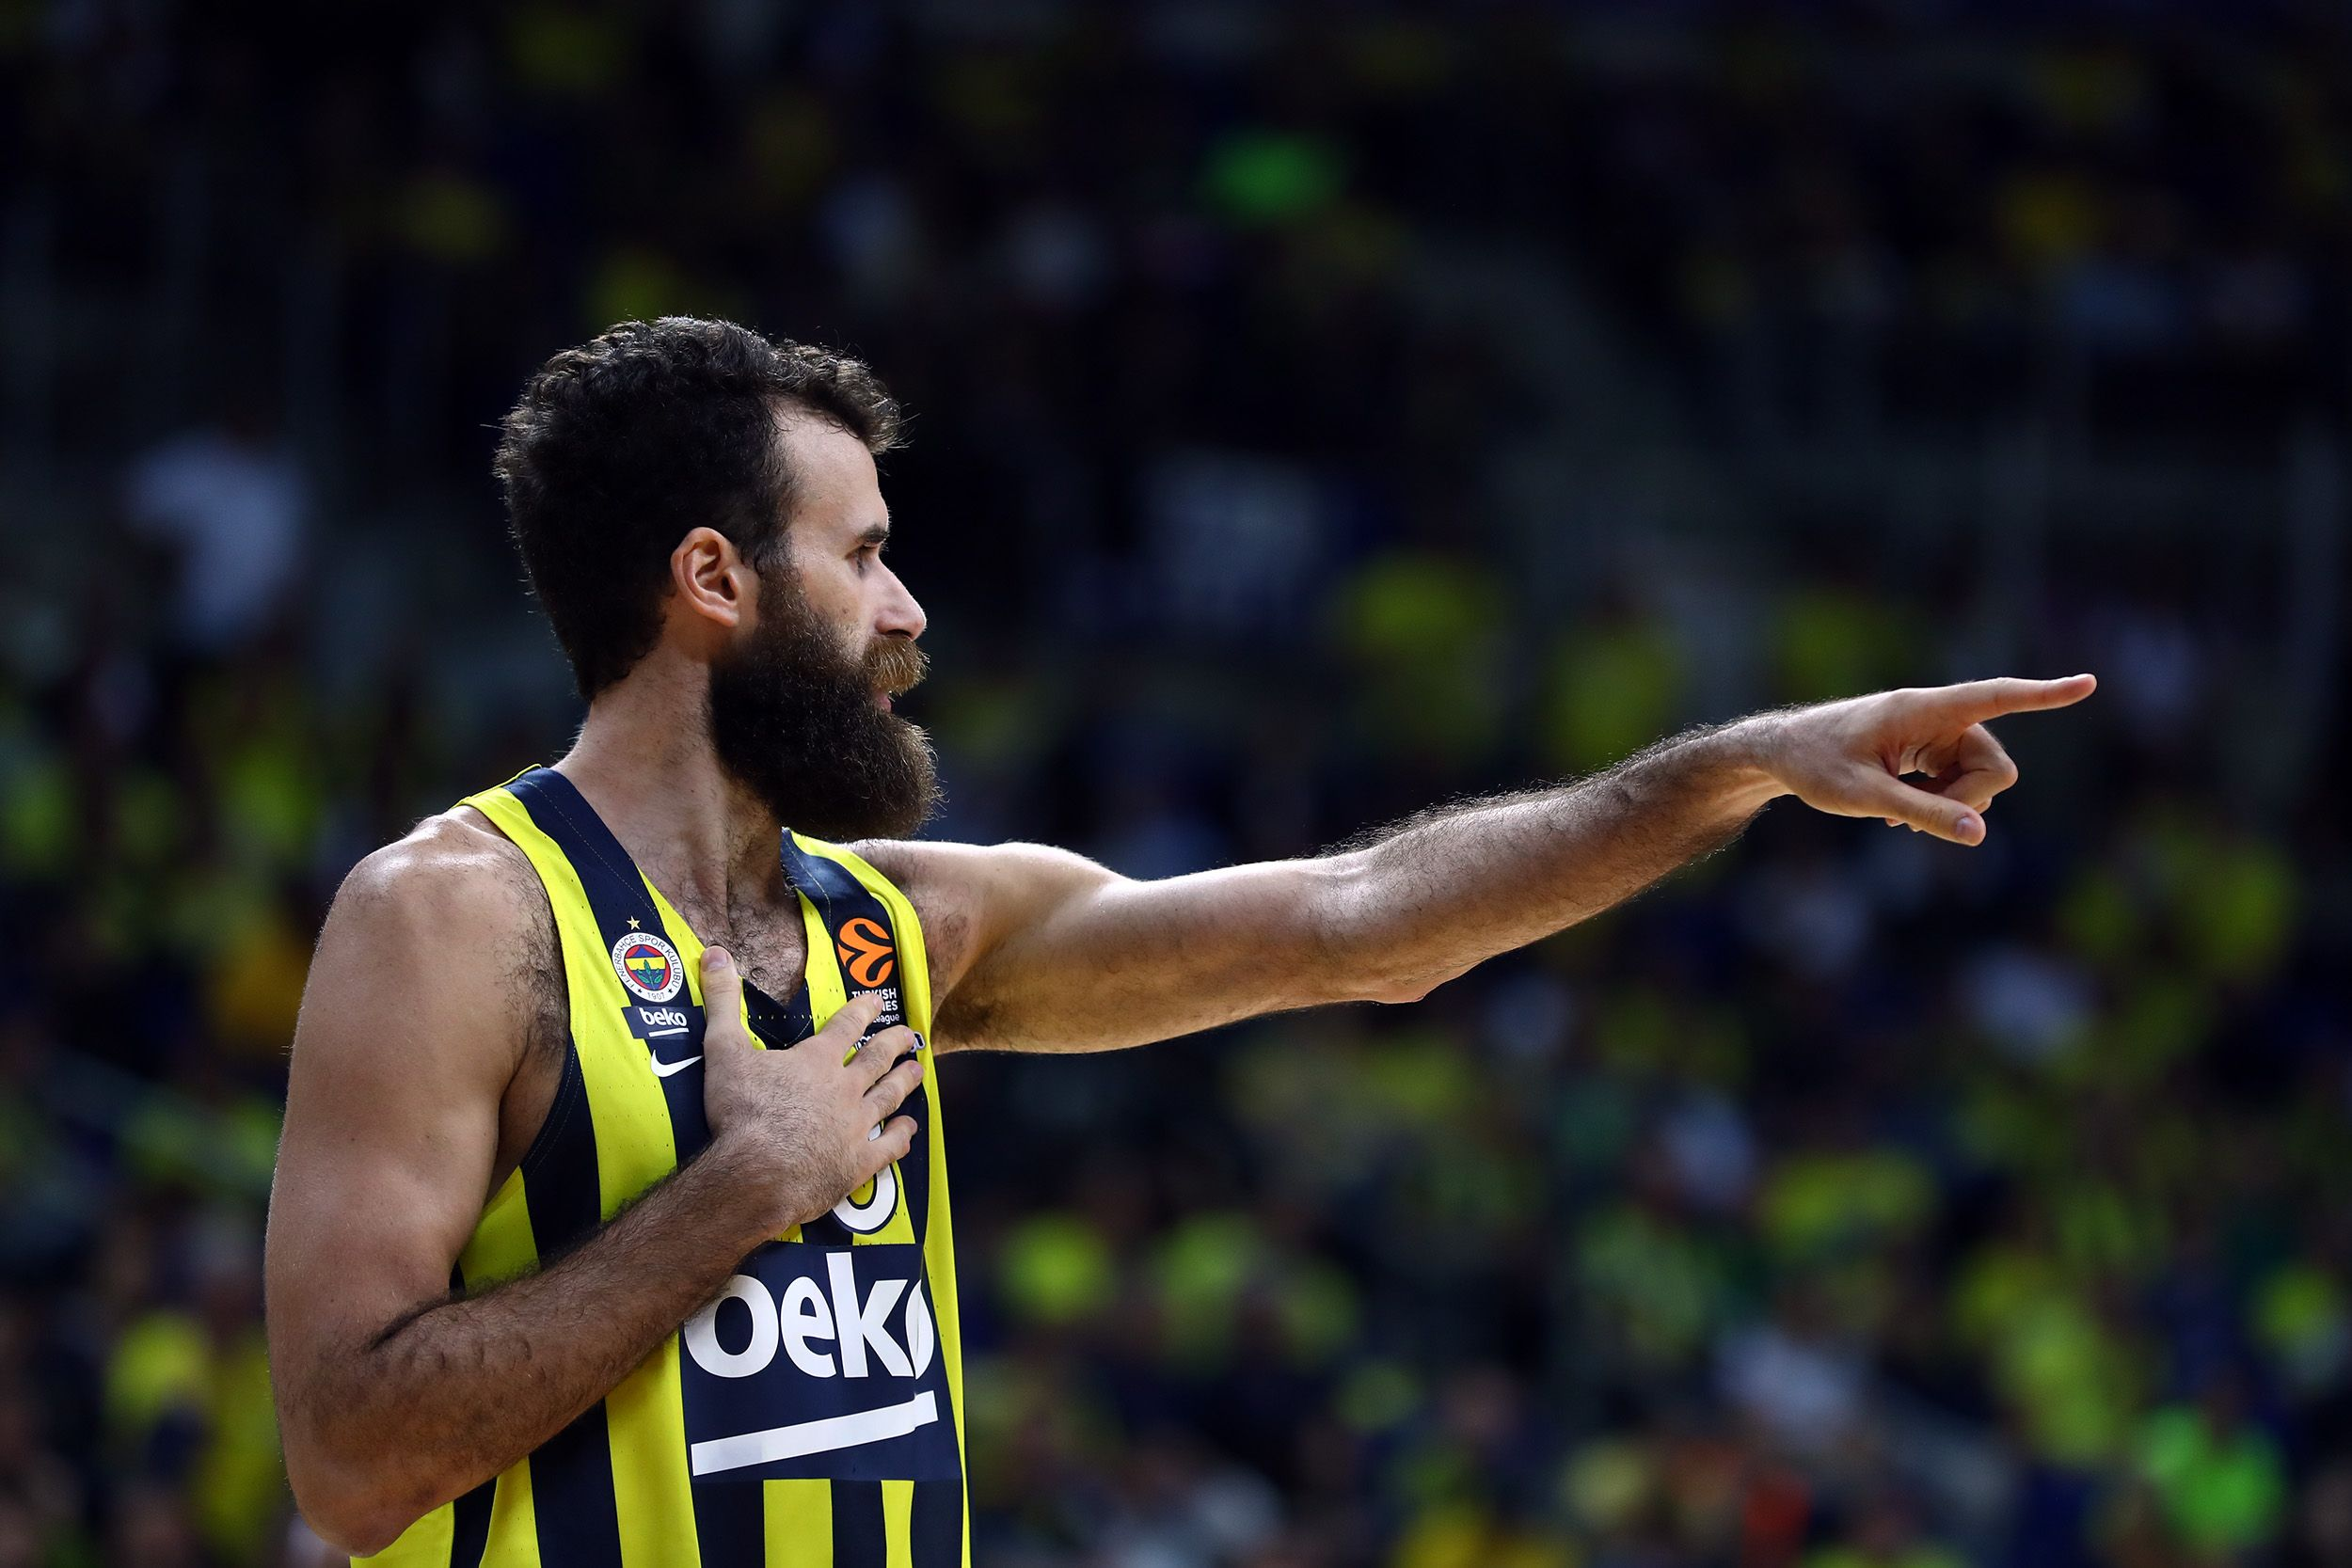 Datome Fenerbahçe Polonara Baskonia De Colo